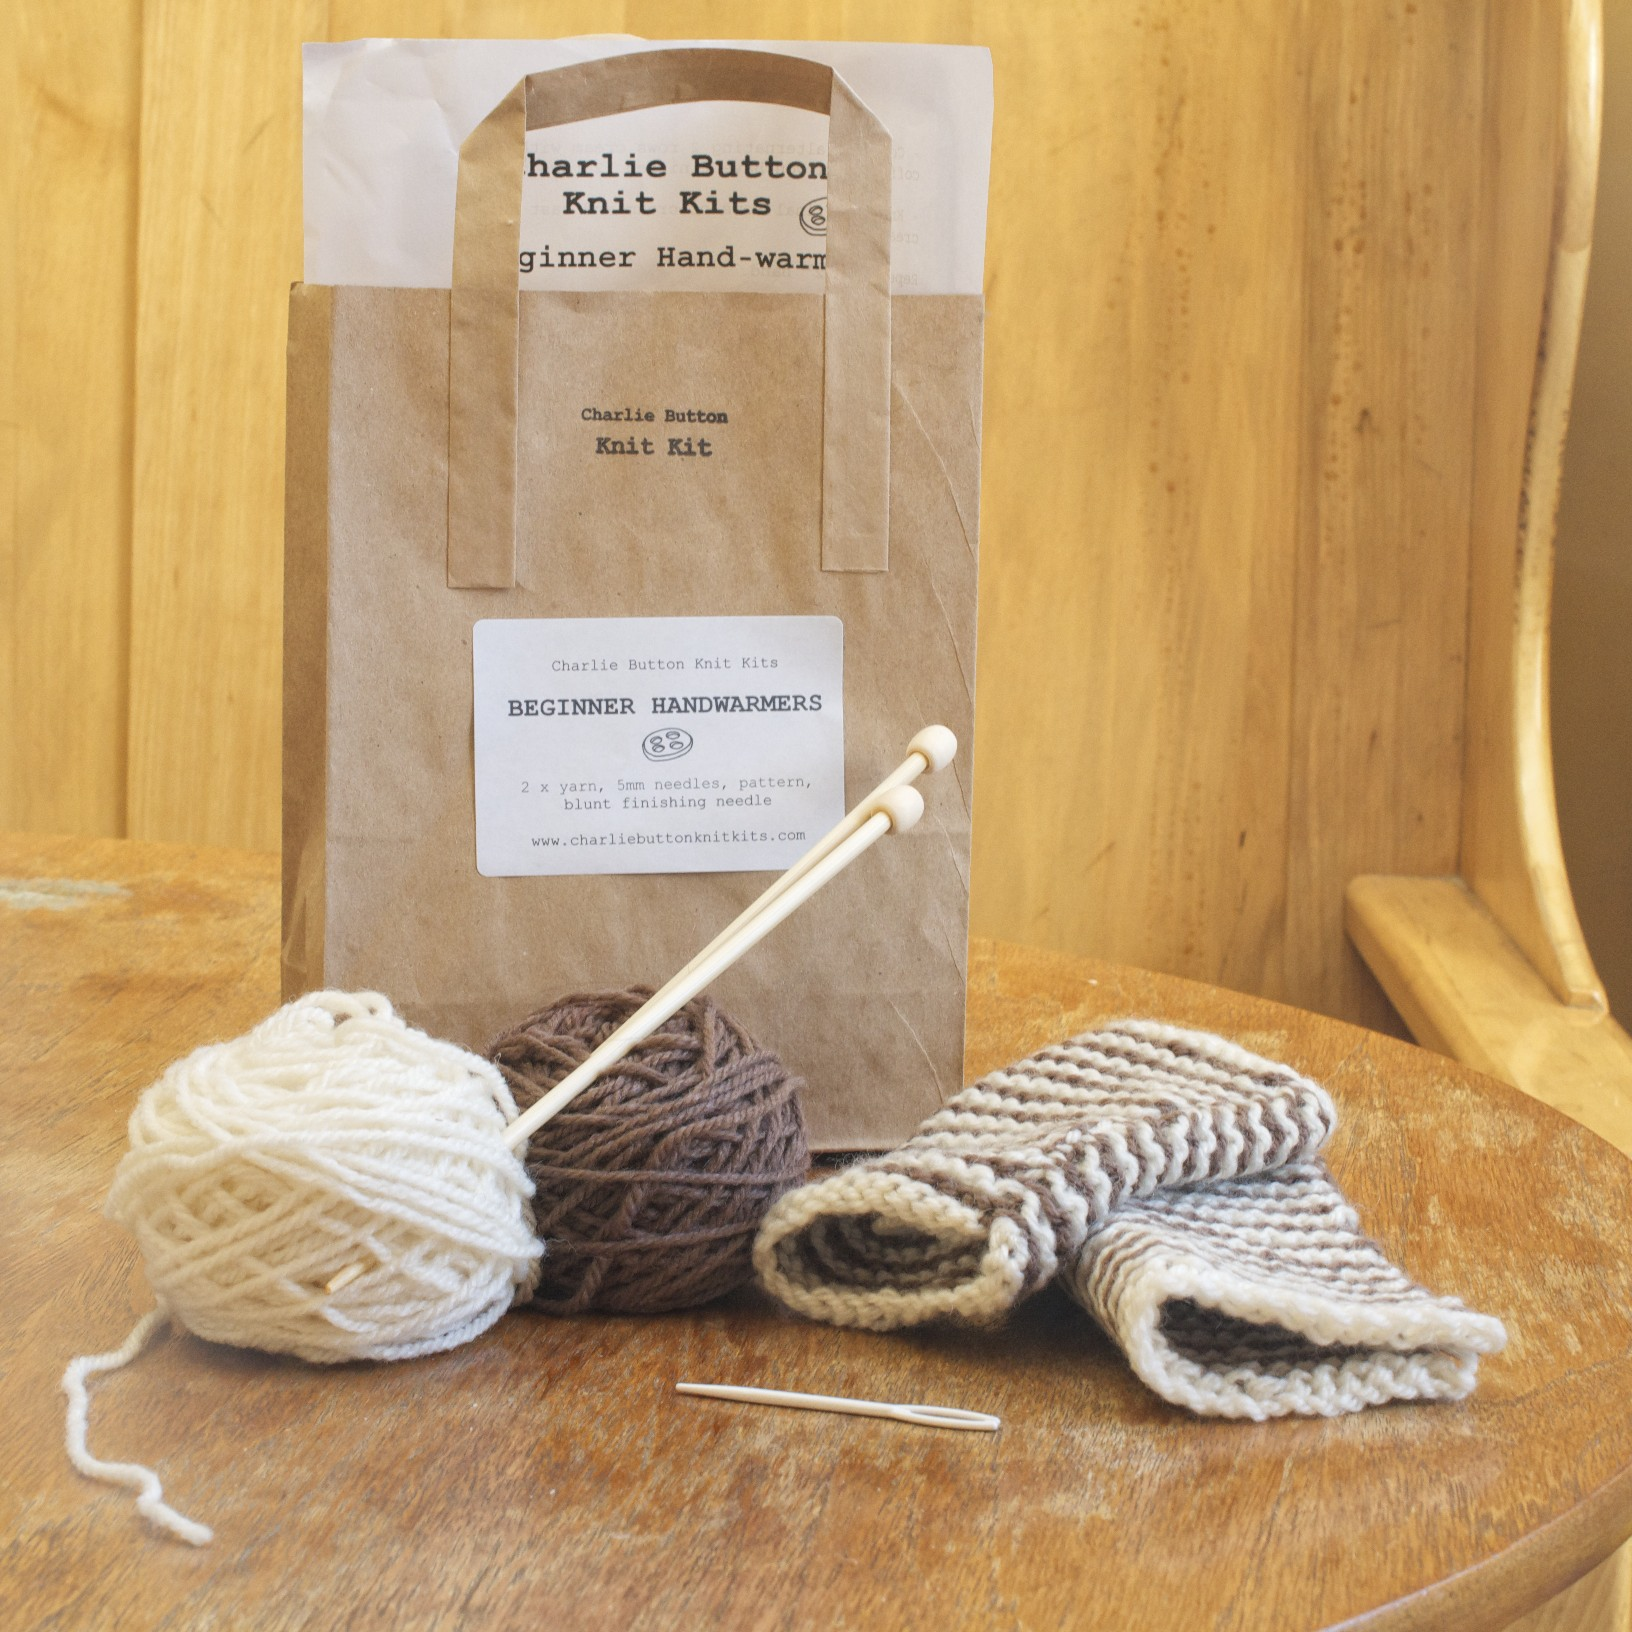 Knitting kits in ... gocpbpd